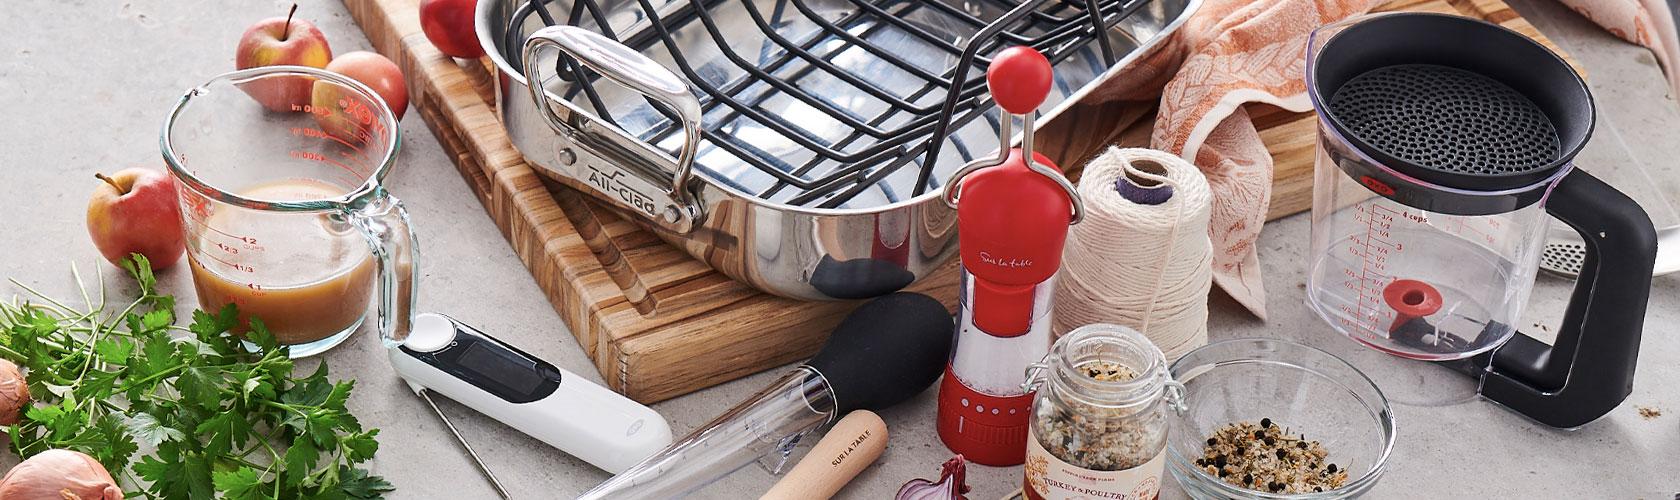 Thanksgiving roasting pan and tools